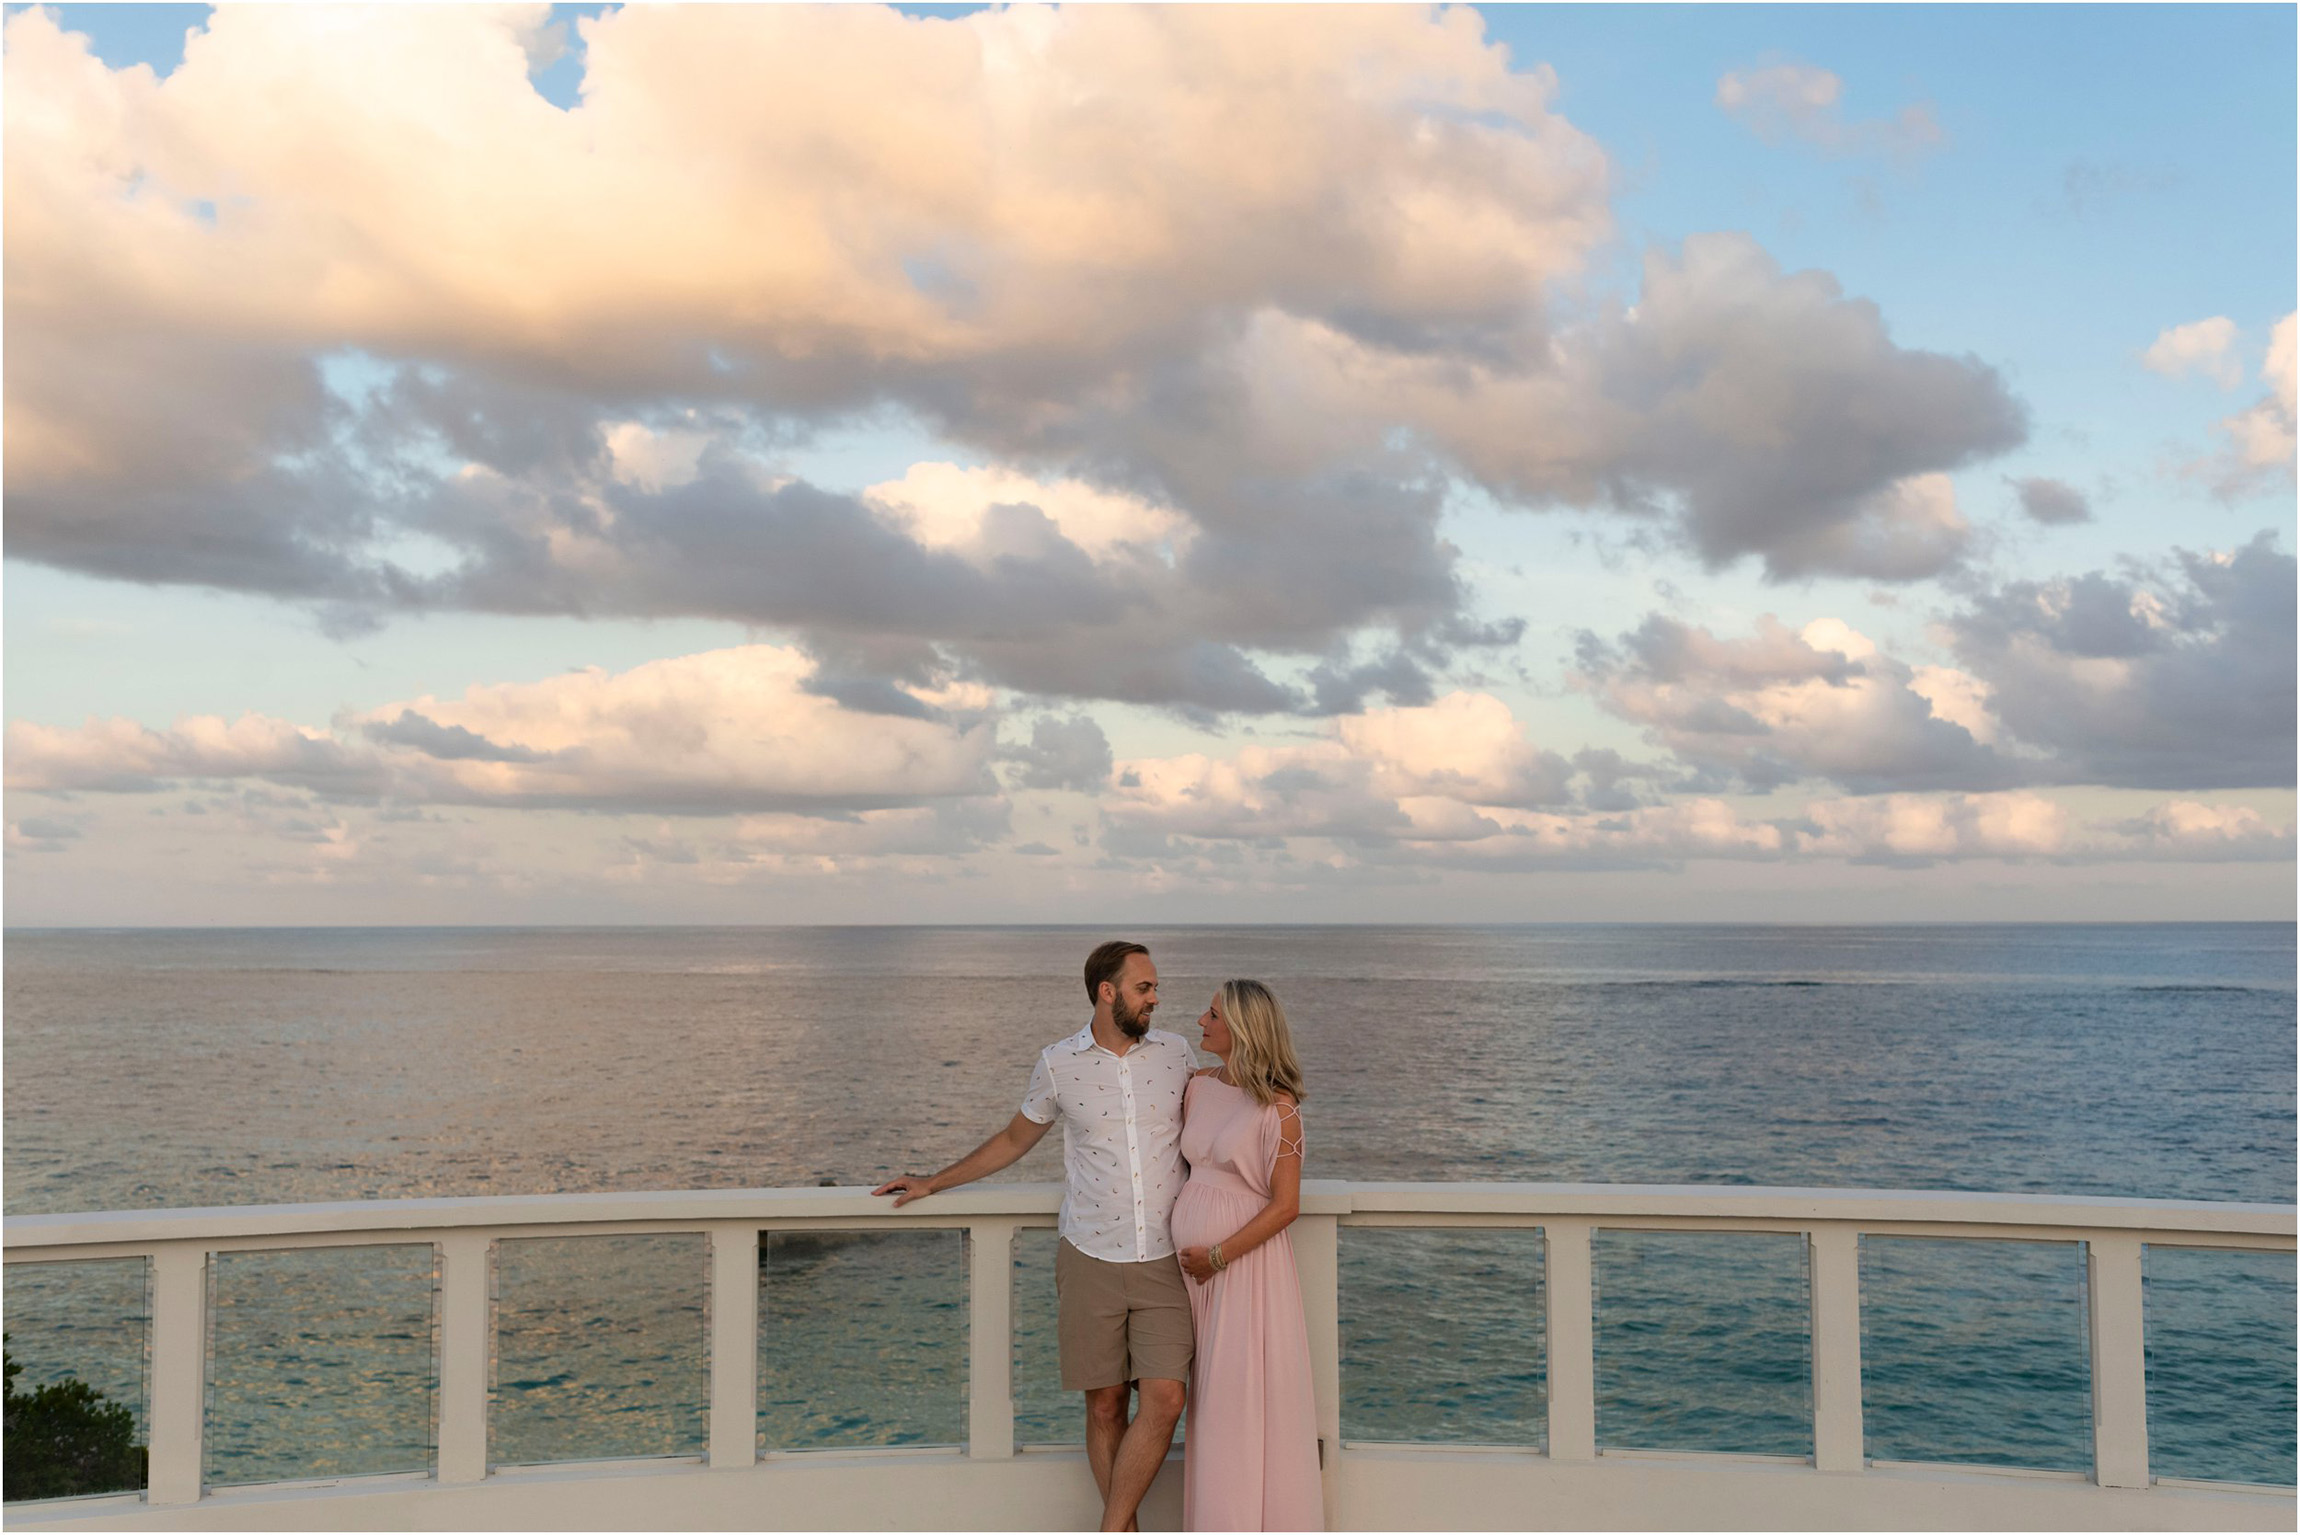 ©FianderFoto_Bermuda_Tom Moore's Jungle_Proposal Maternity Photographer_Erika_Andy_028.jpg